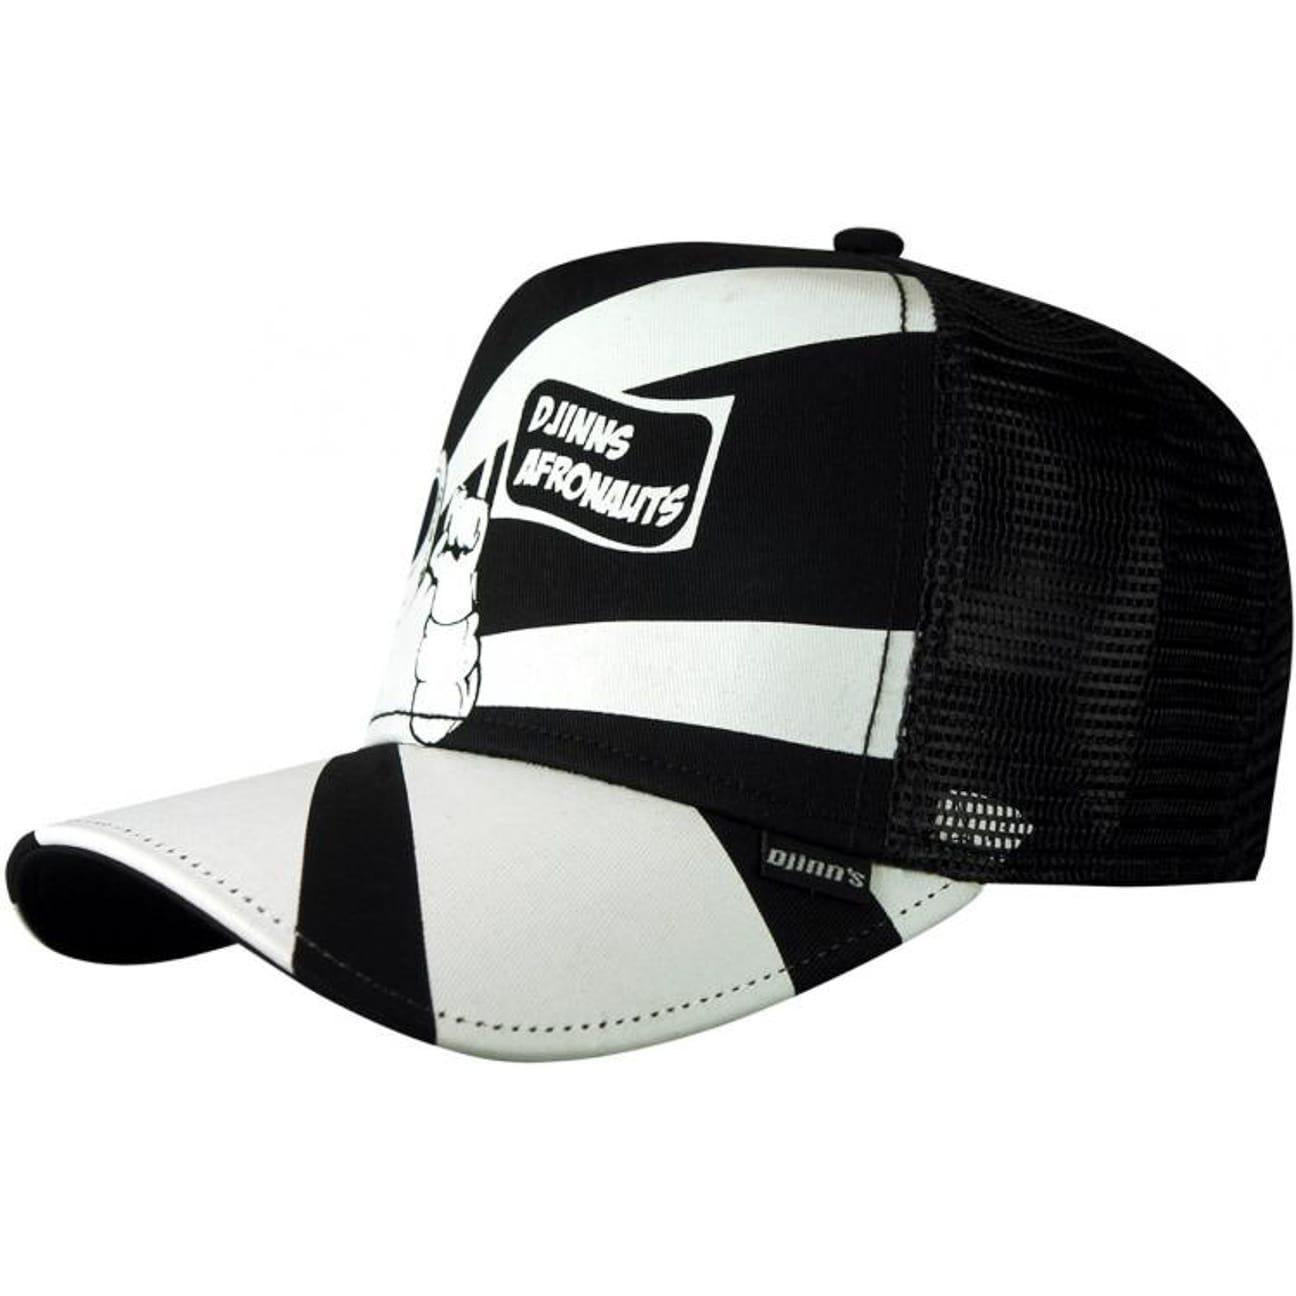 afronaut trucker cap by djinns eur 19 99 hats caps. Black Bedroom Furniture Sets. Home Design Ideas